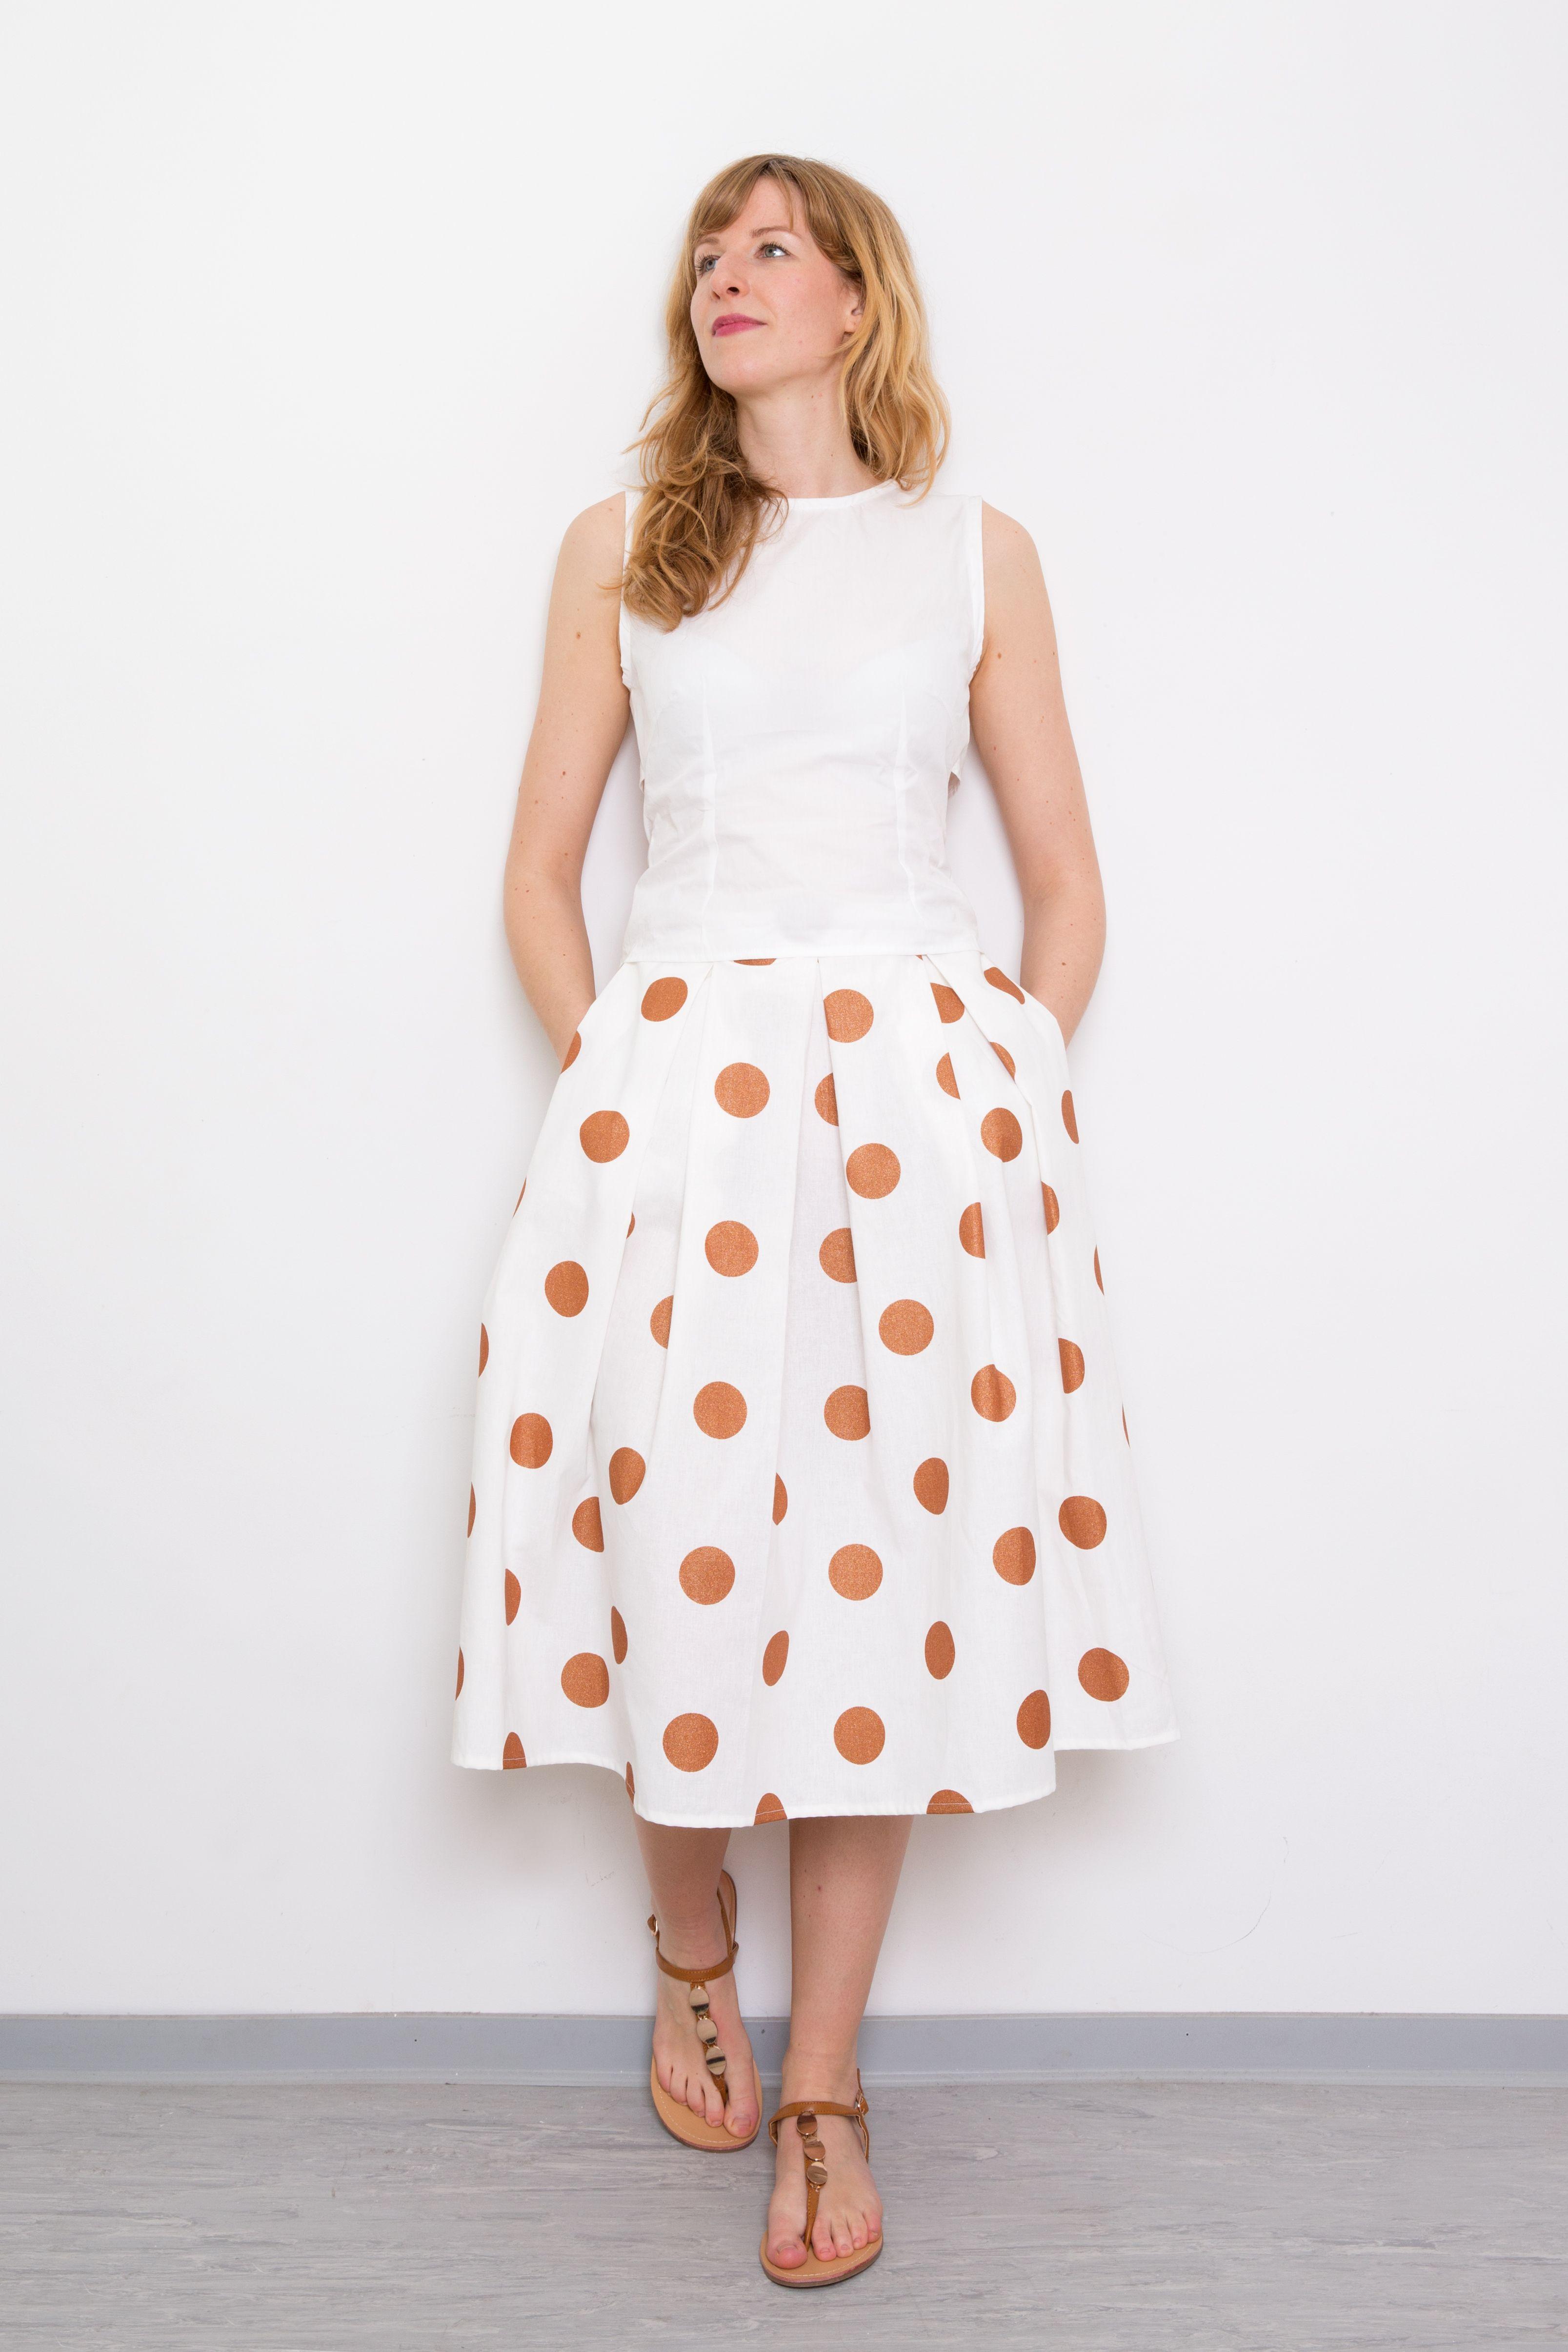 Rock Kupfer Liebe | Frühling/Sommer Outfits | Pinterest | Kupfer ...